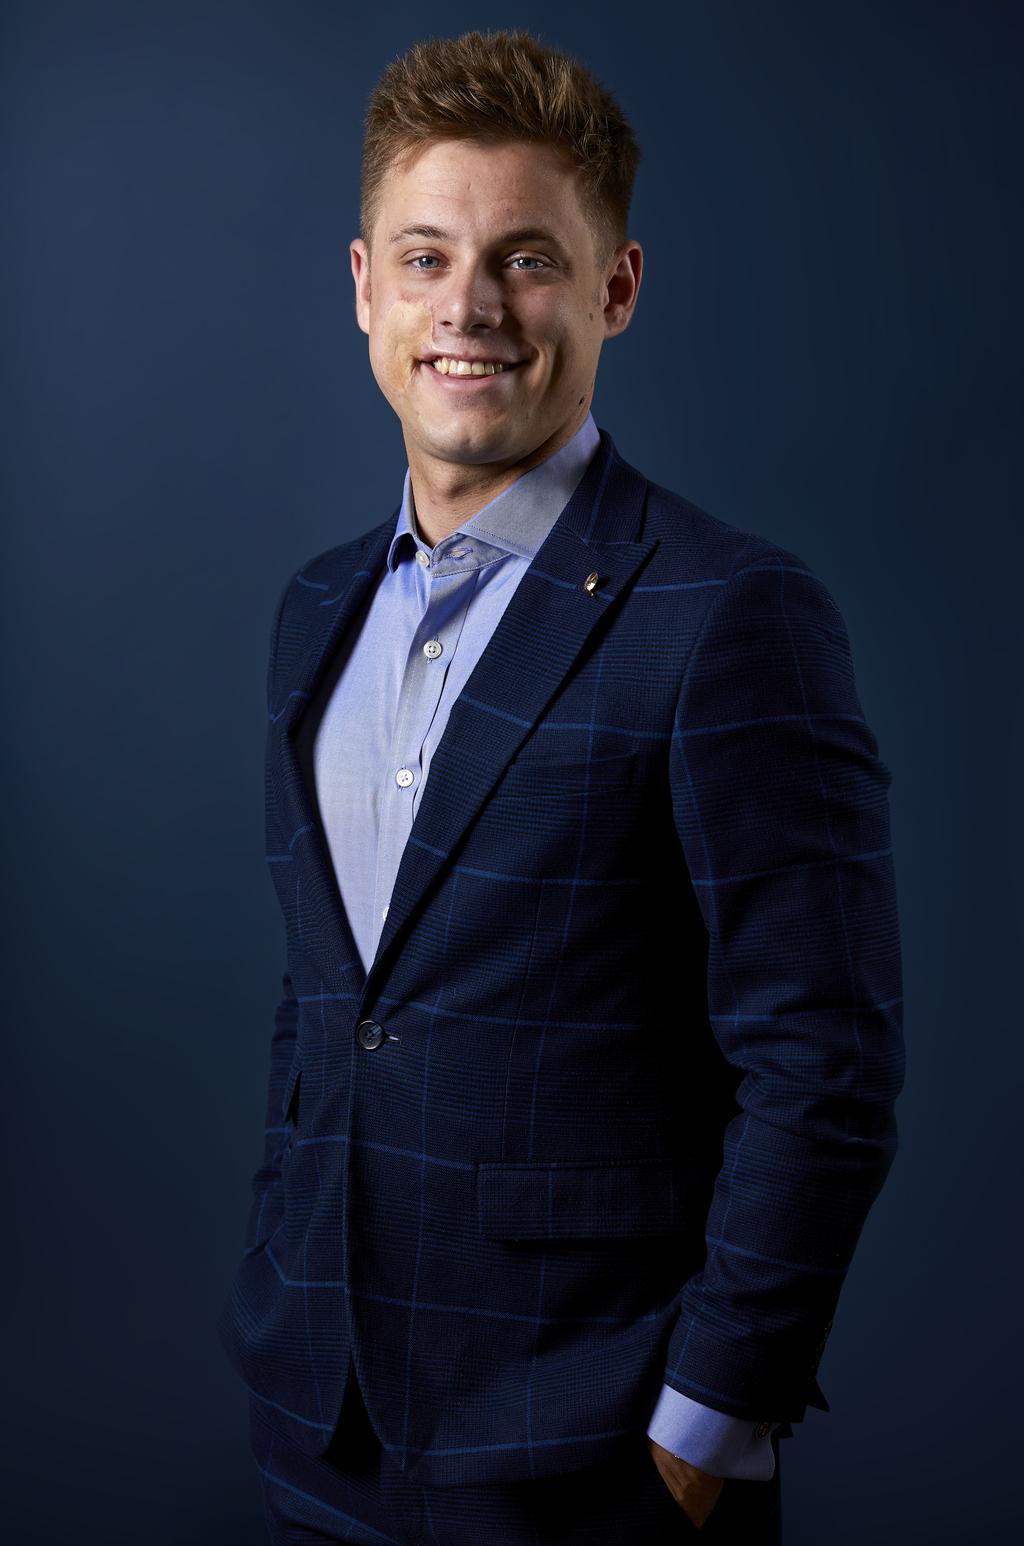 Tomáš Kubart